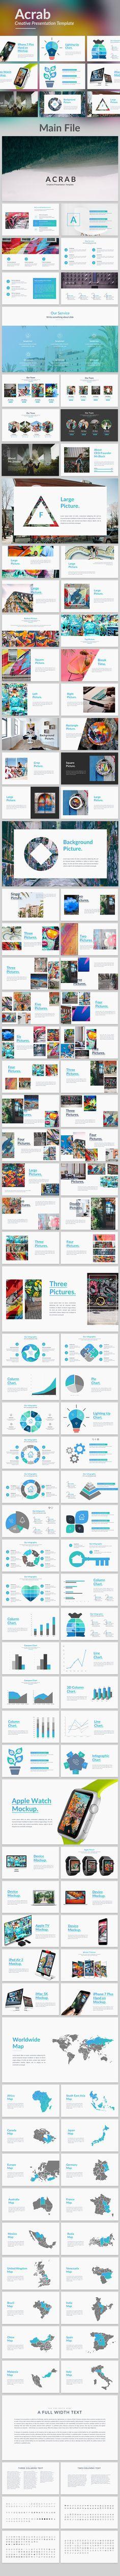 Muray Creative Powerpoint Template — Powerpoint PPT #minimal modern ...